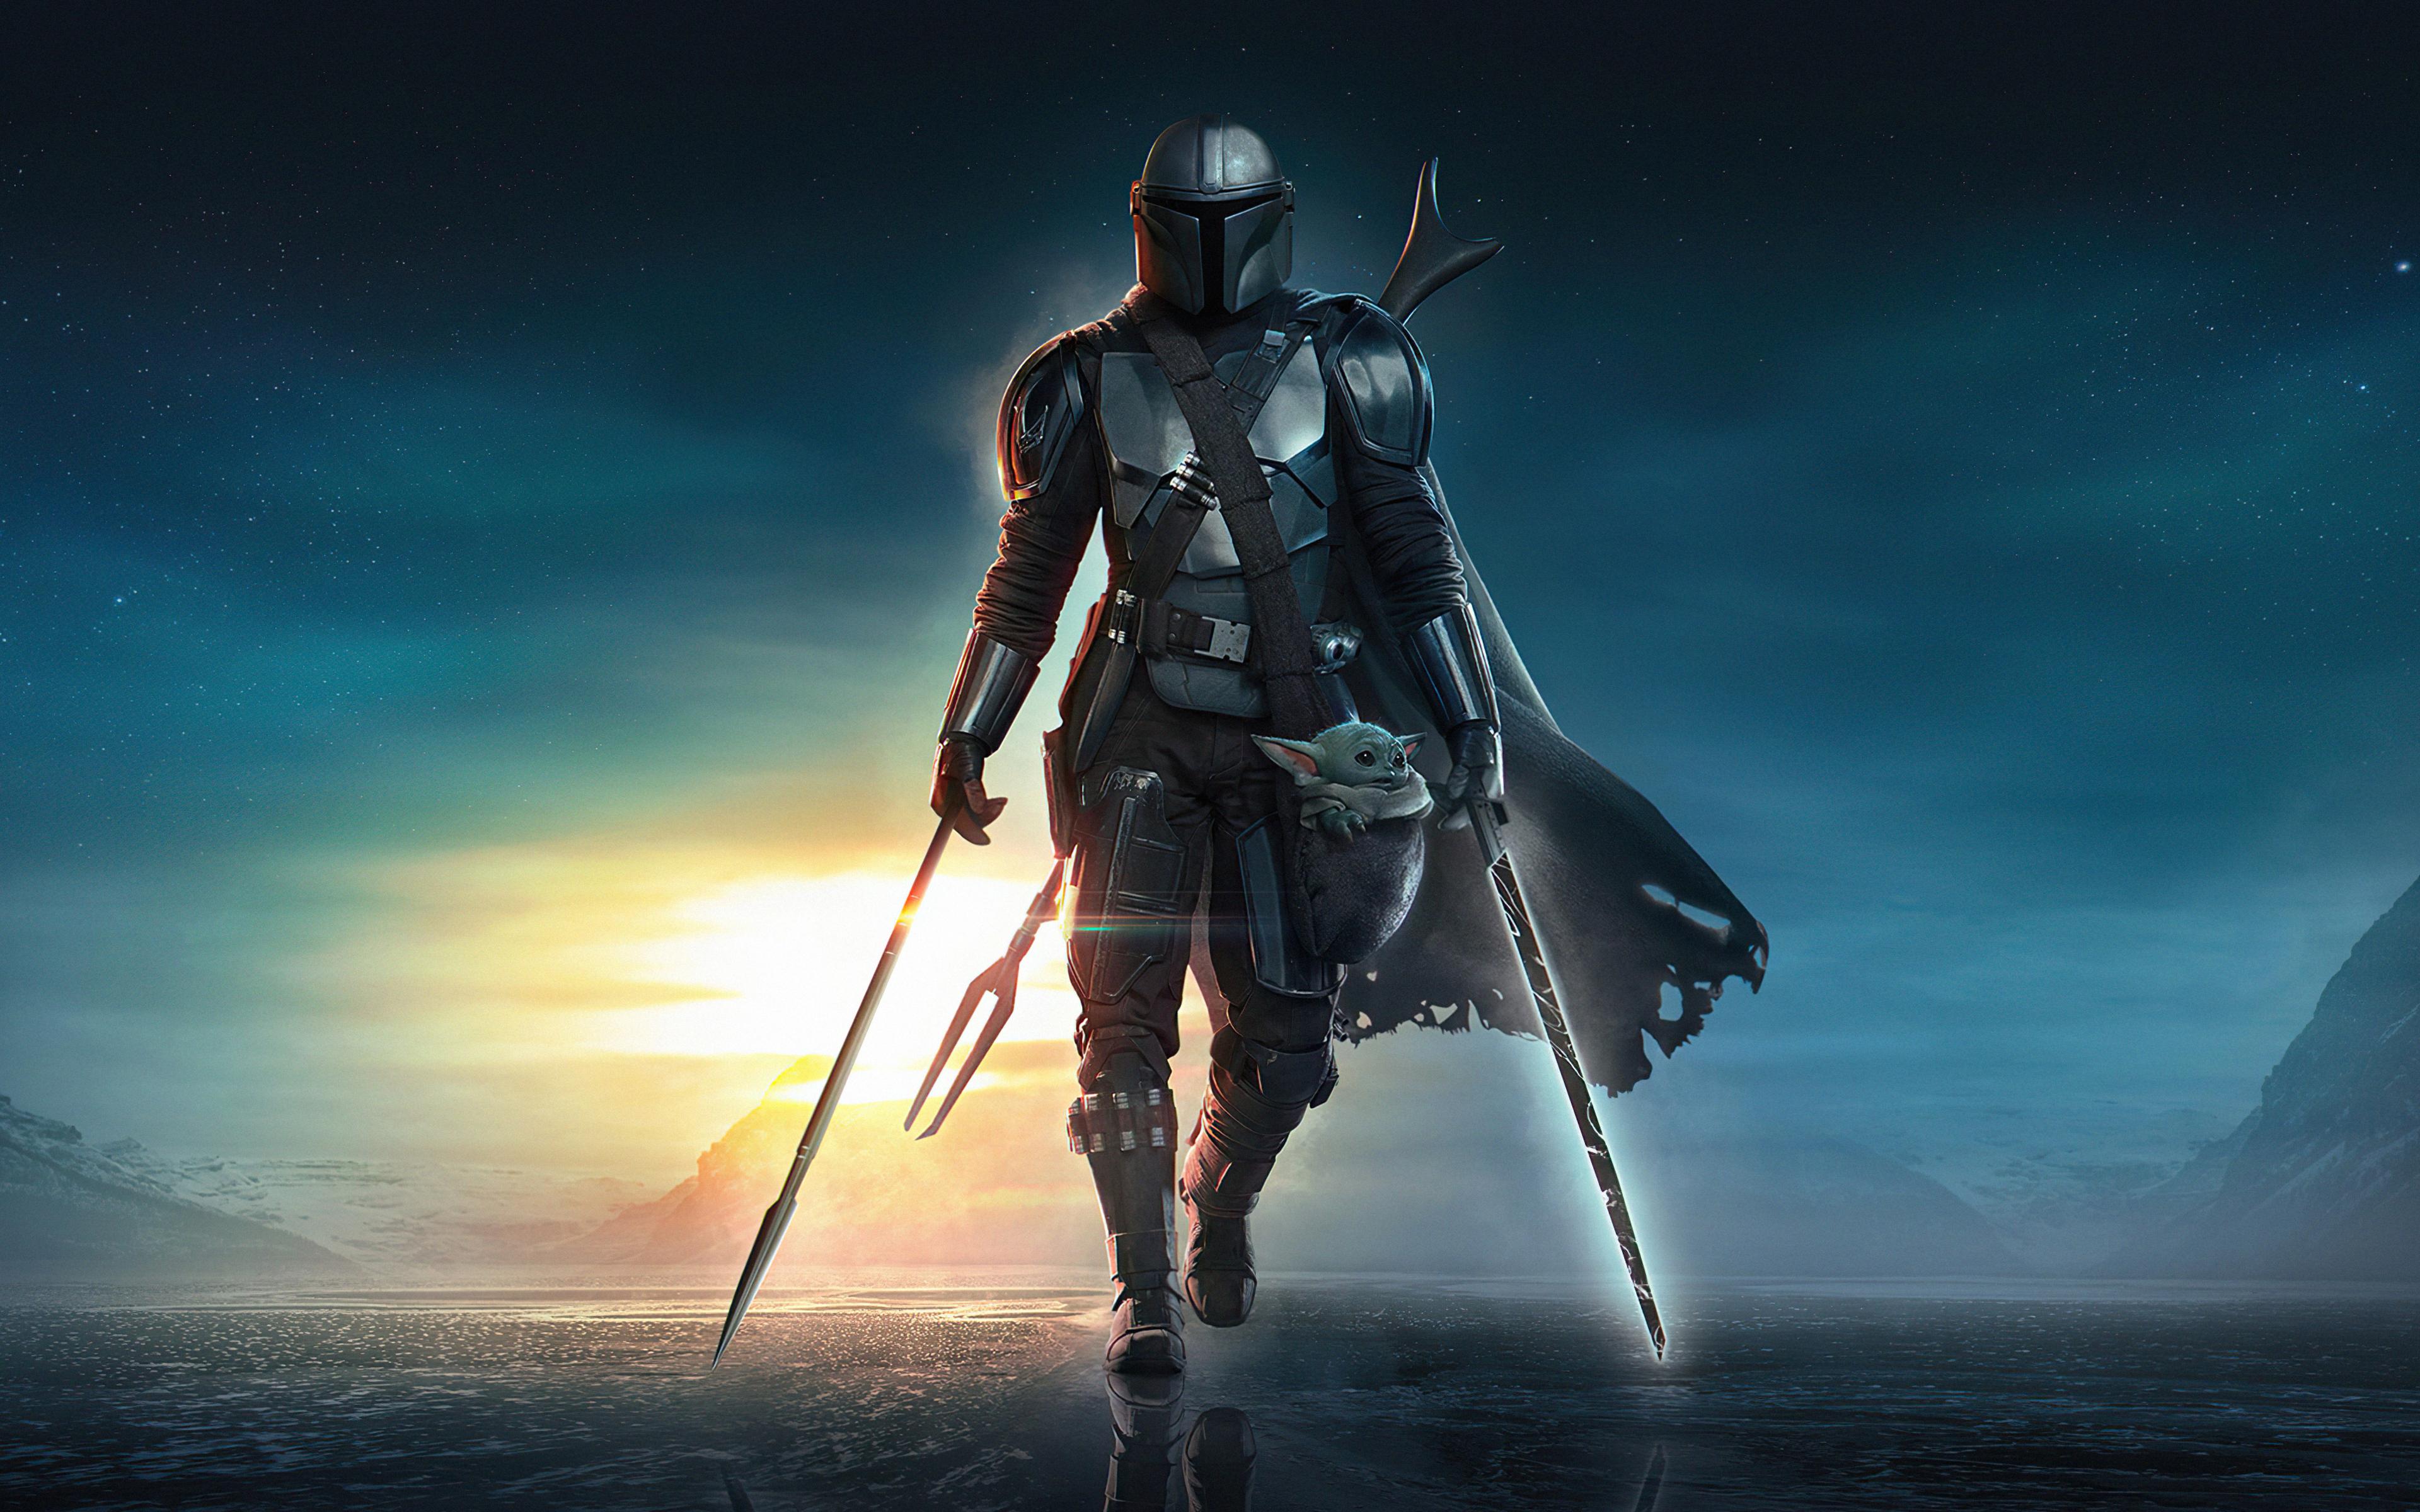 the-mandalorian-beskar-spear-and-the-darksaber-4k-us.jpg